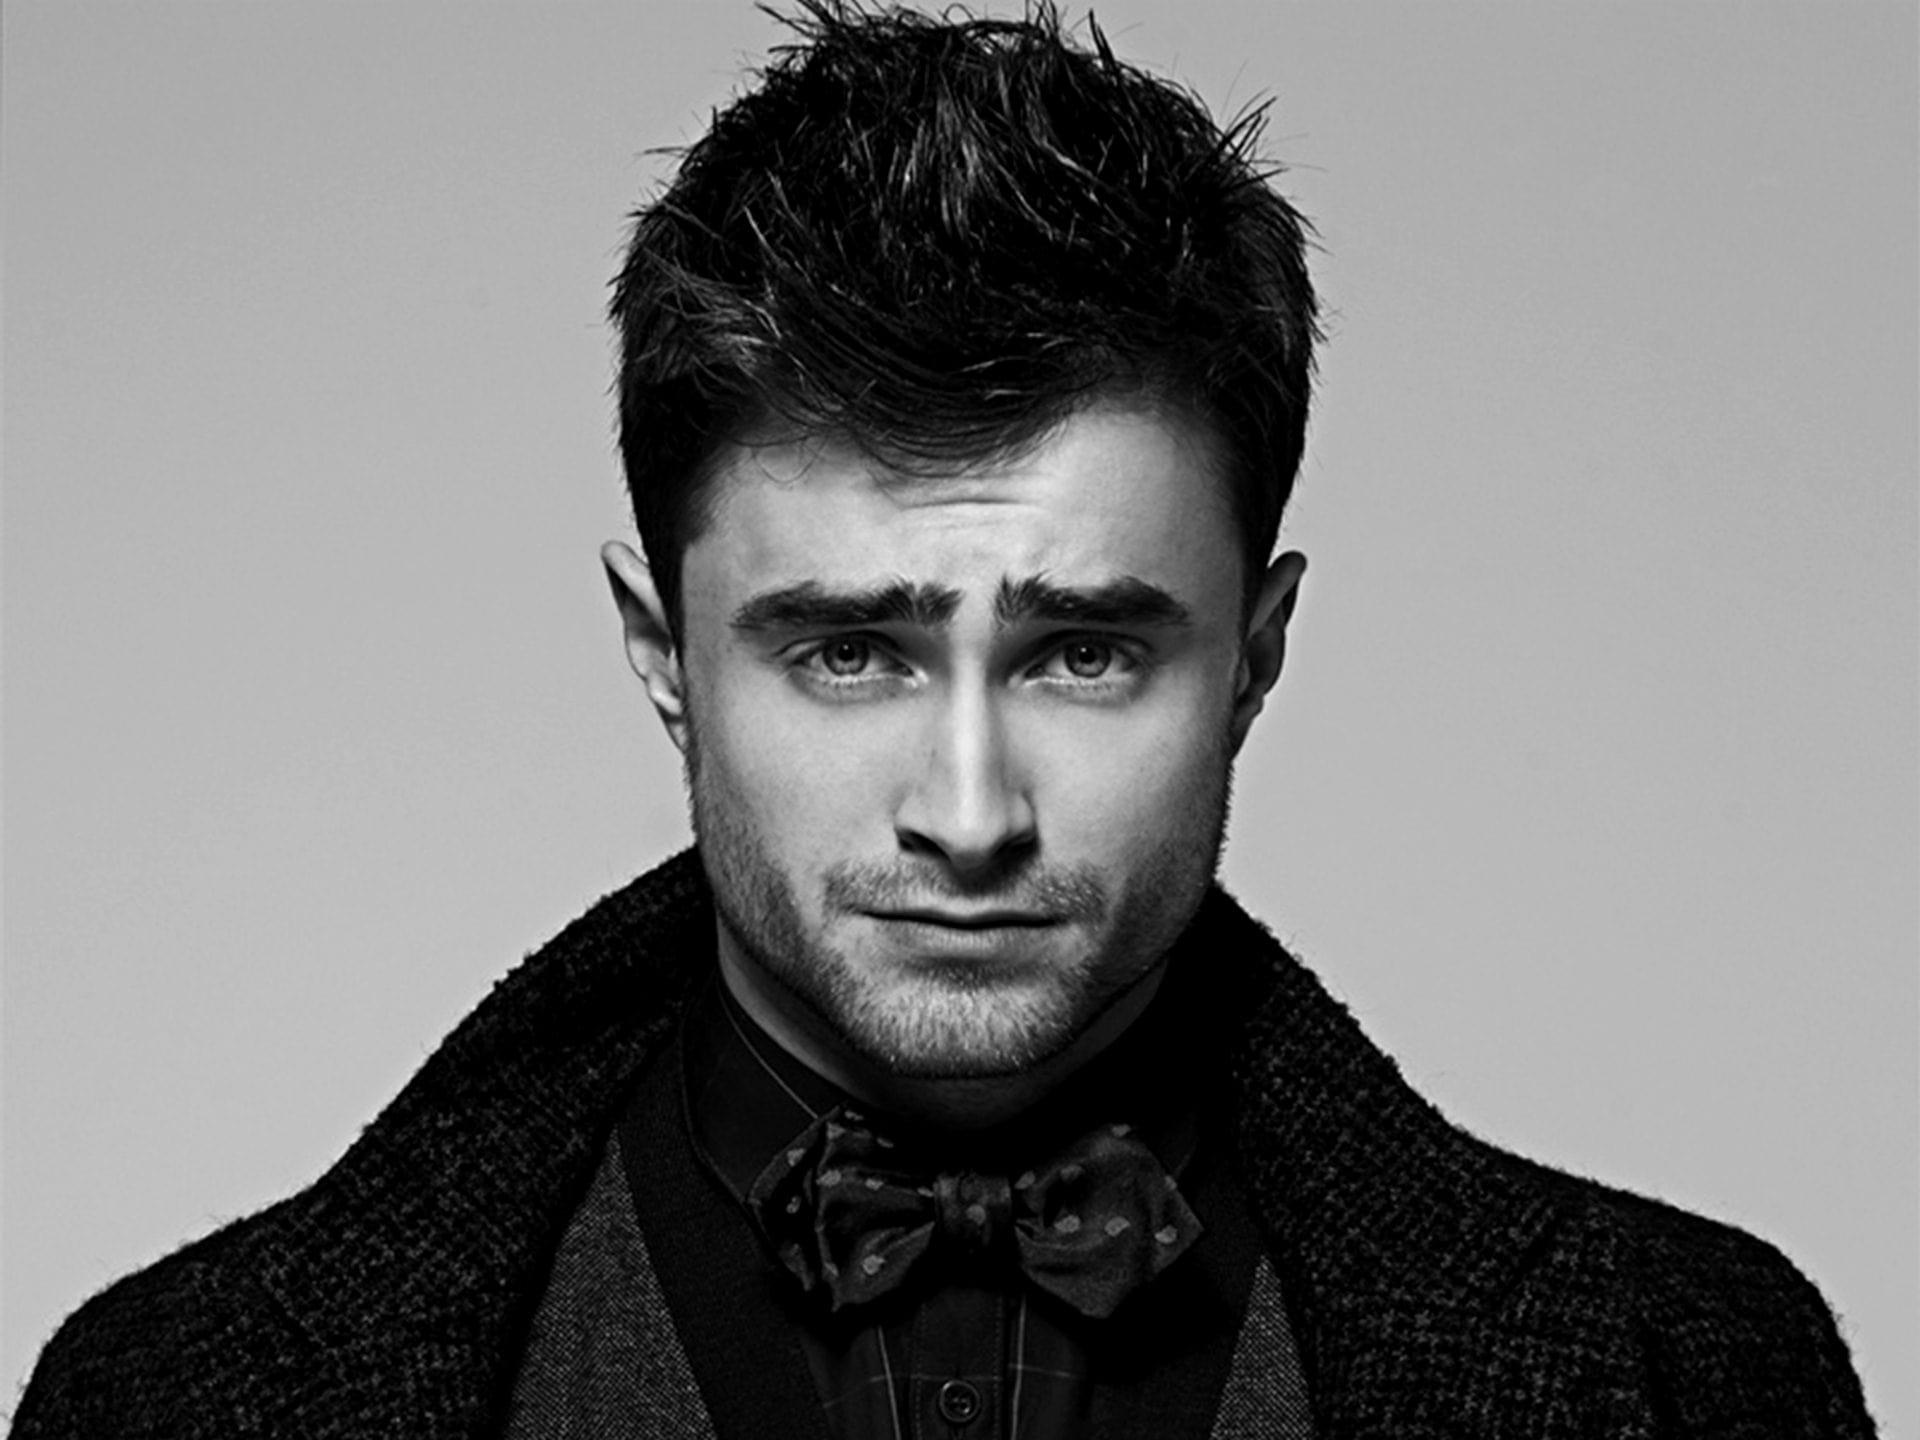 Daniel Radcliffe Wallpapers hd